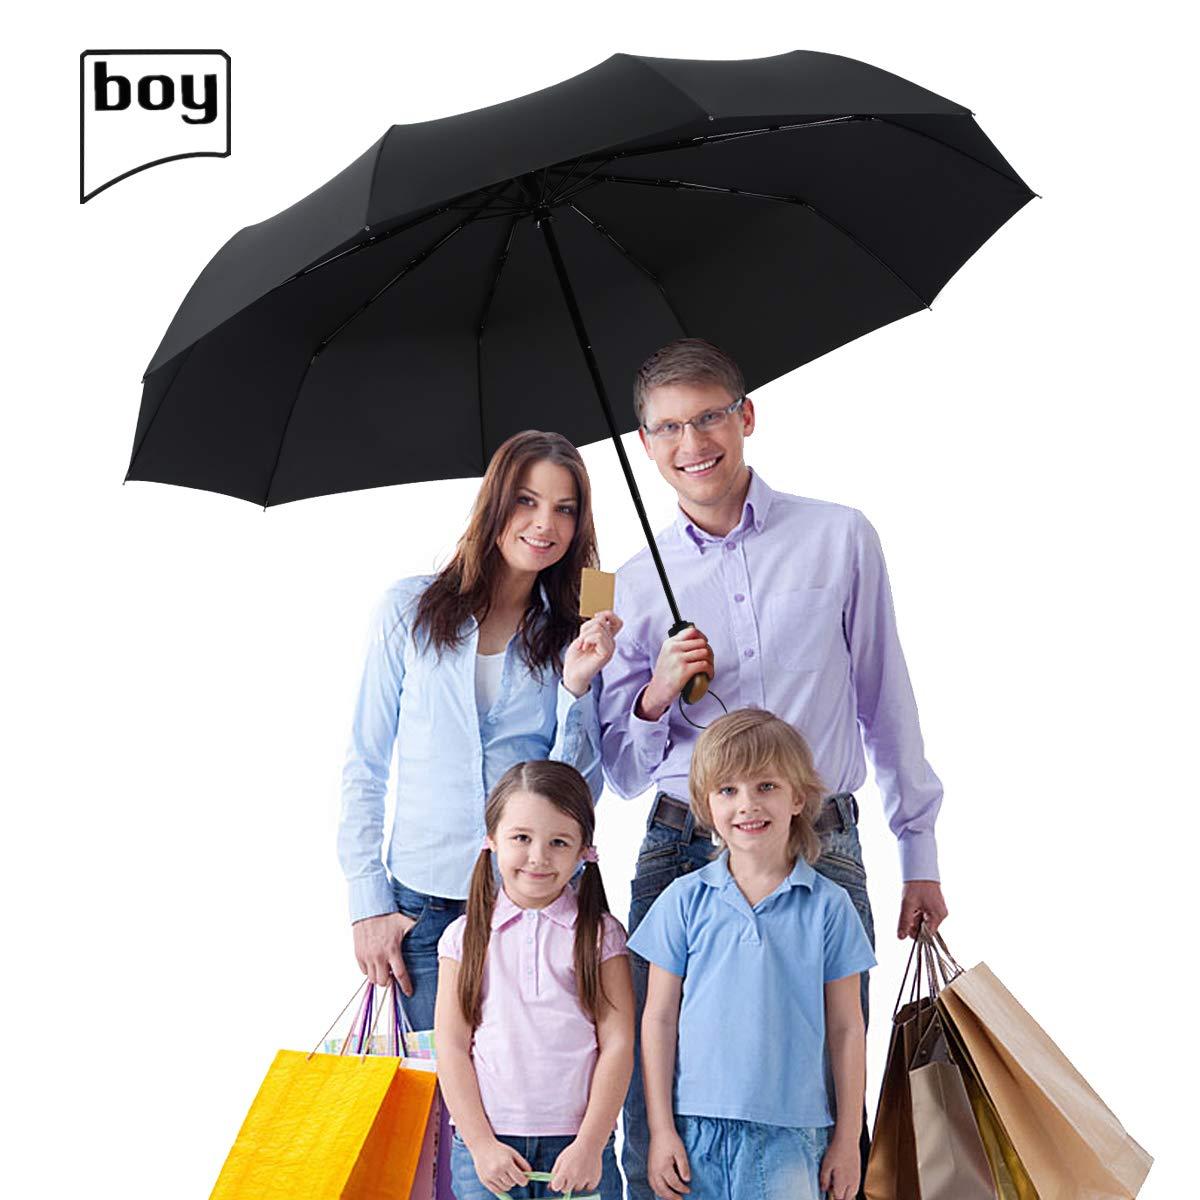 BOY Umbrella Reinforced Automatic Windproof